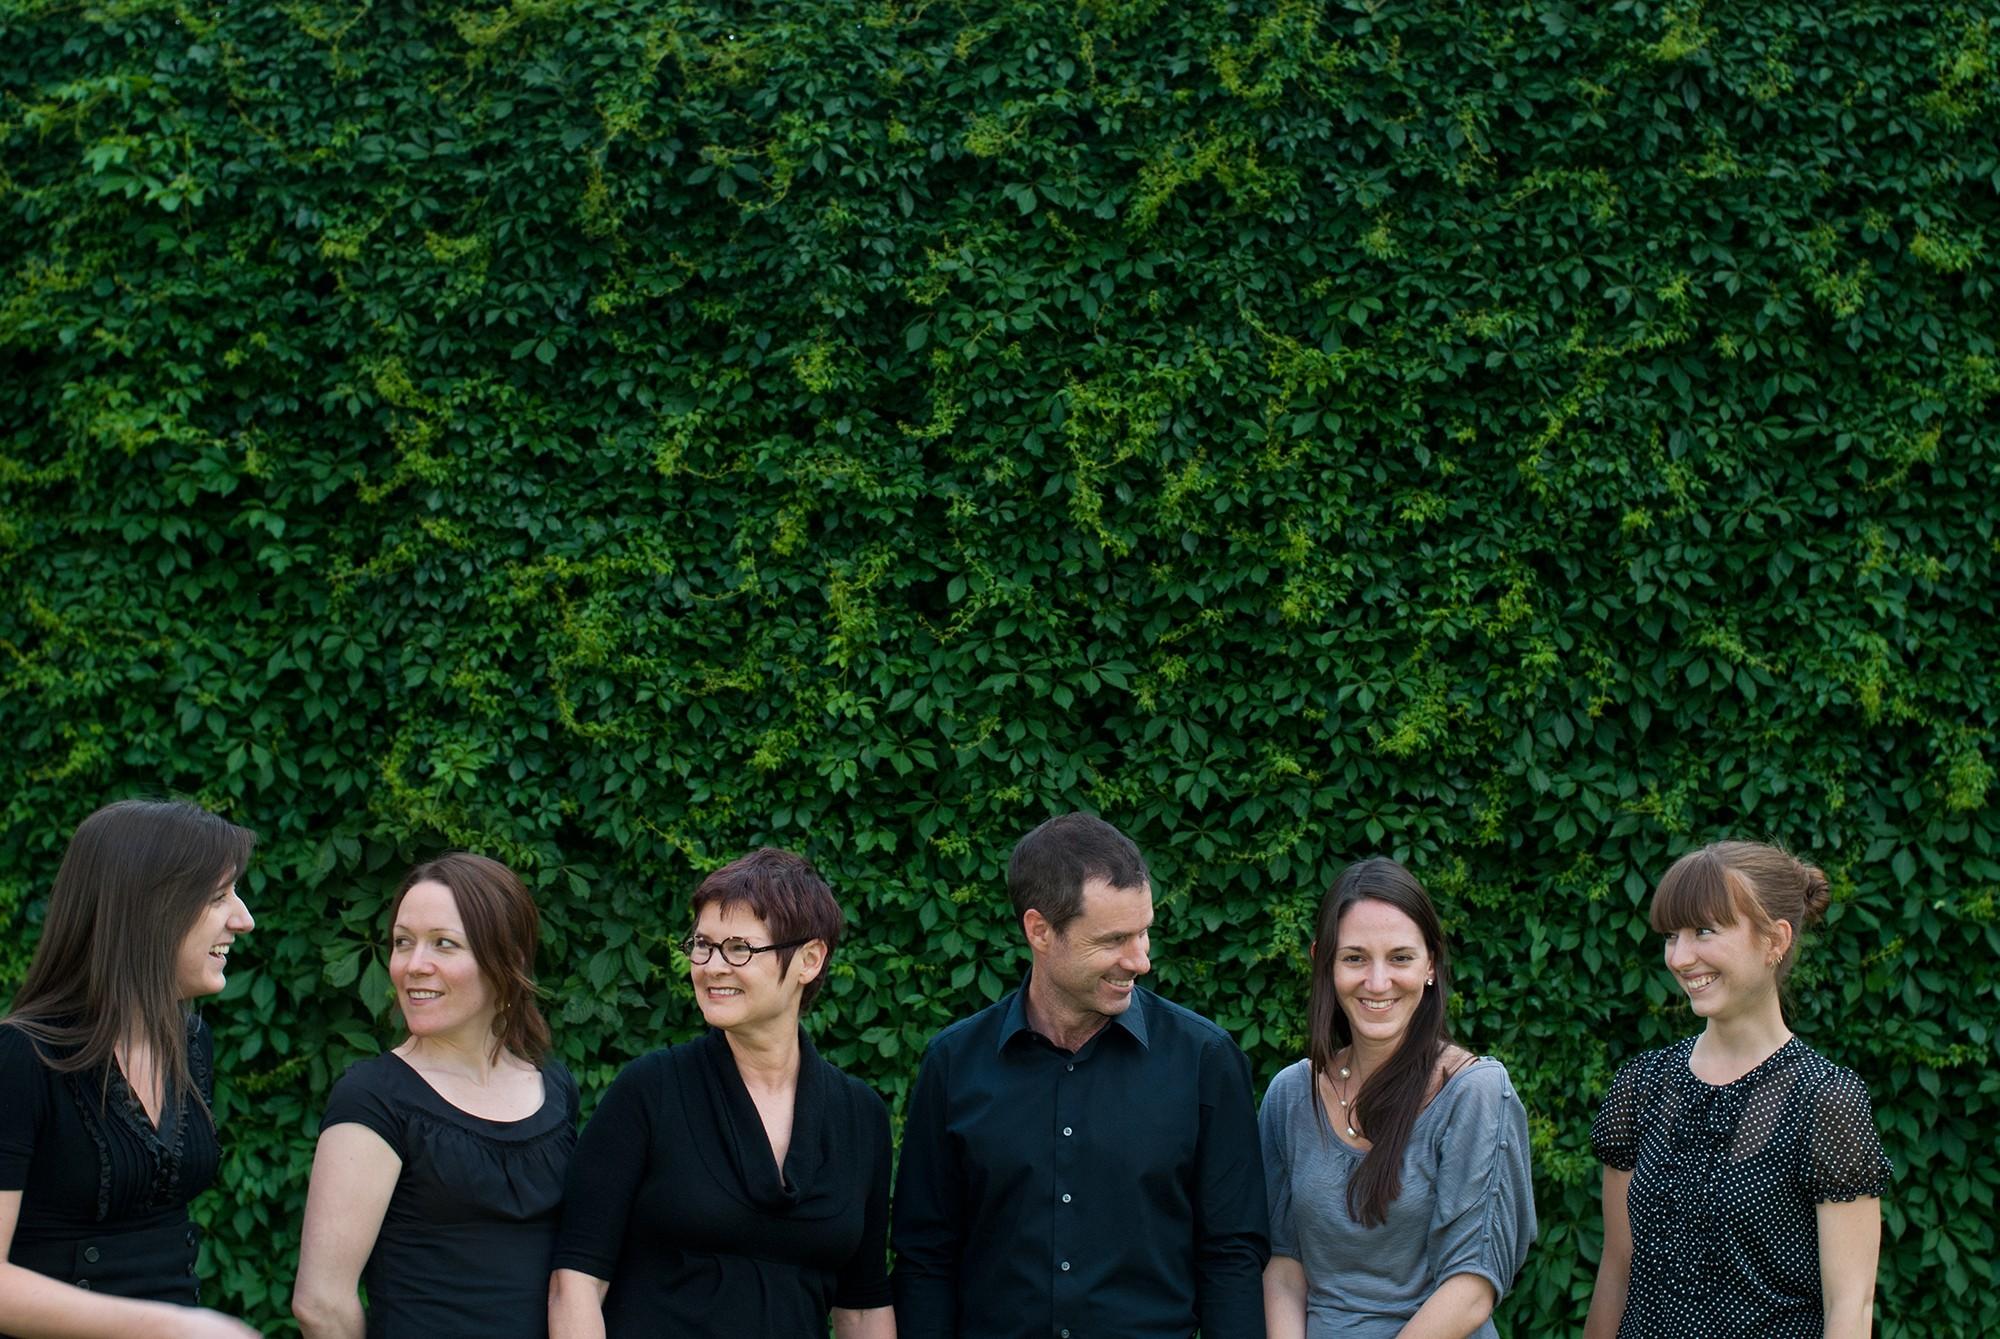 Professional corporate outdoor portrait of work team / Metaphore Design